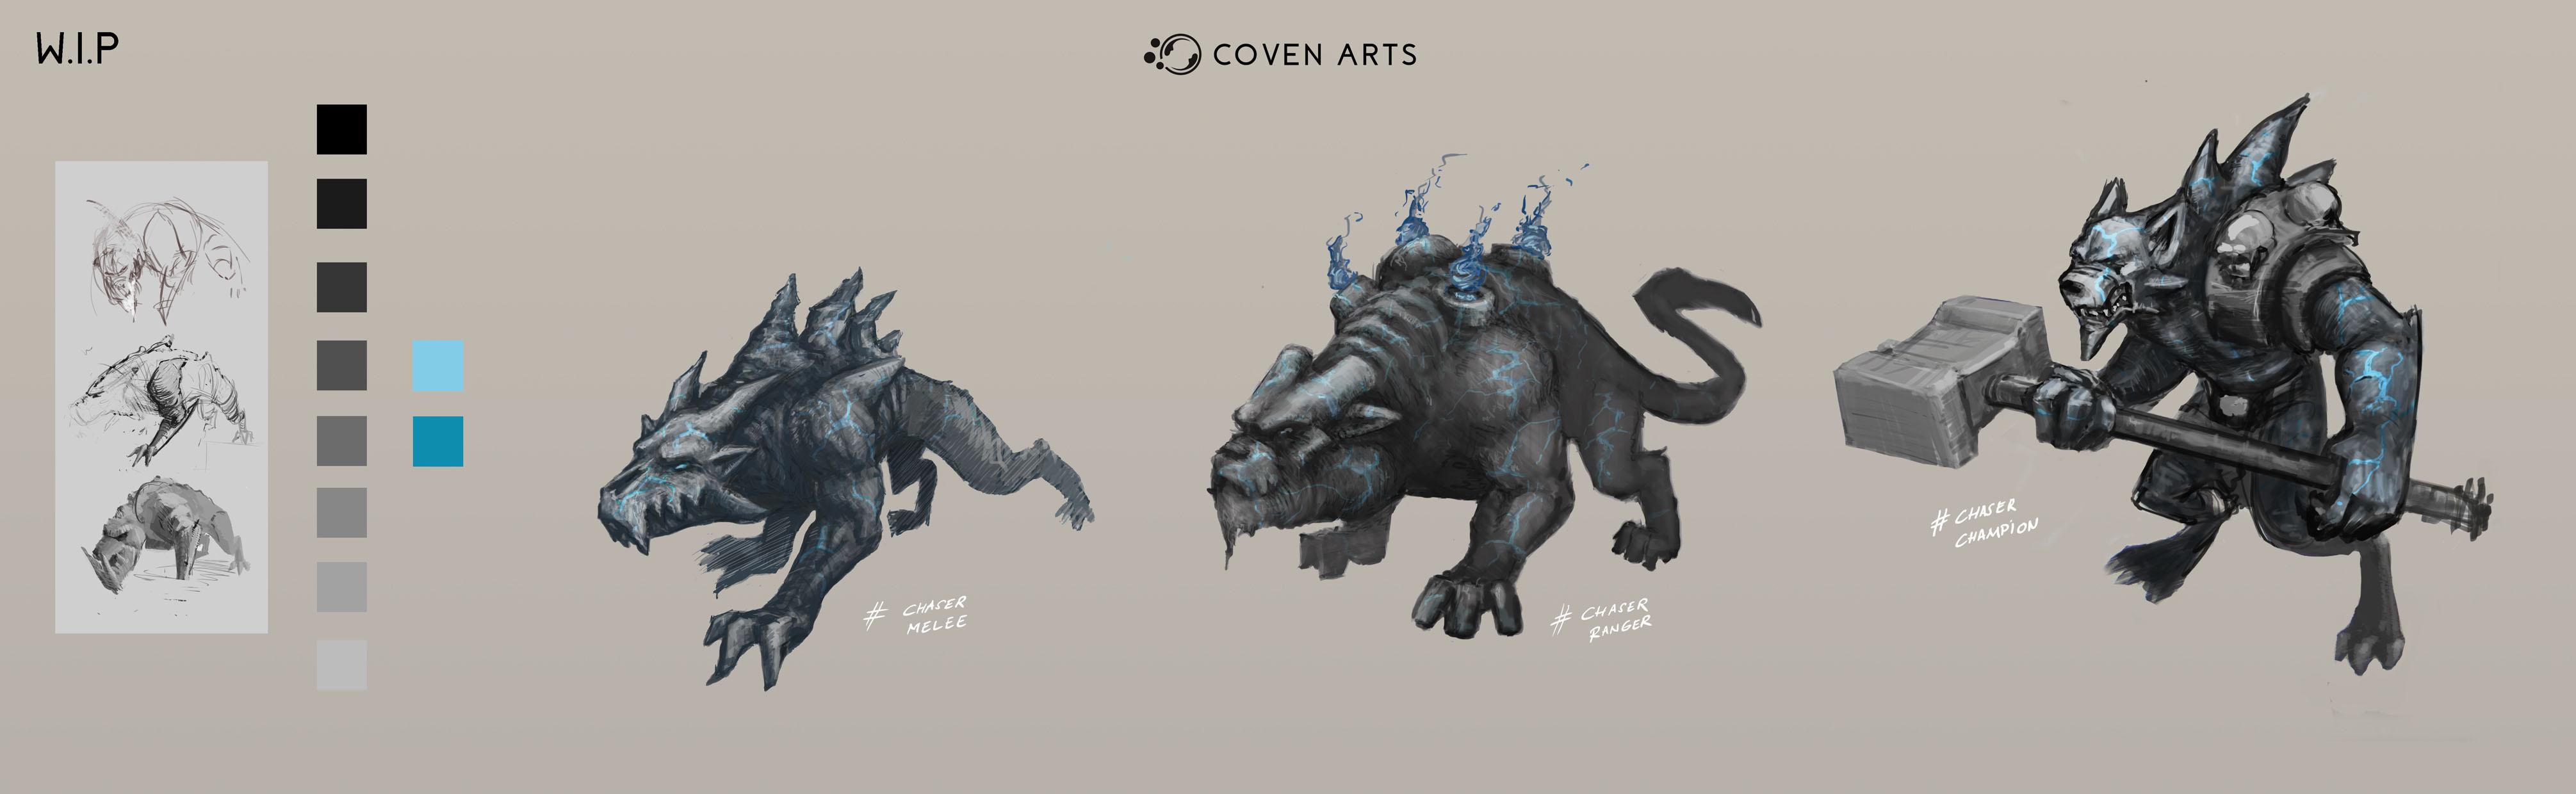 U-tad Coven Arts arte